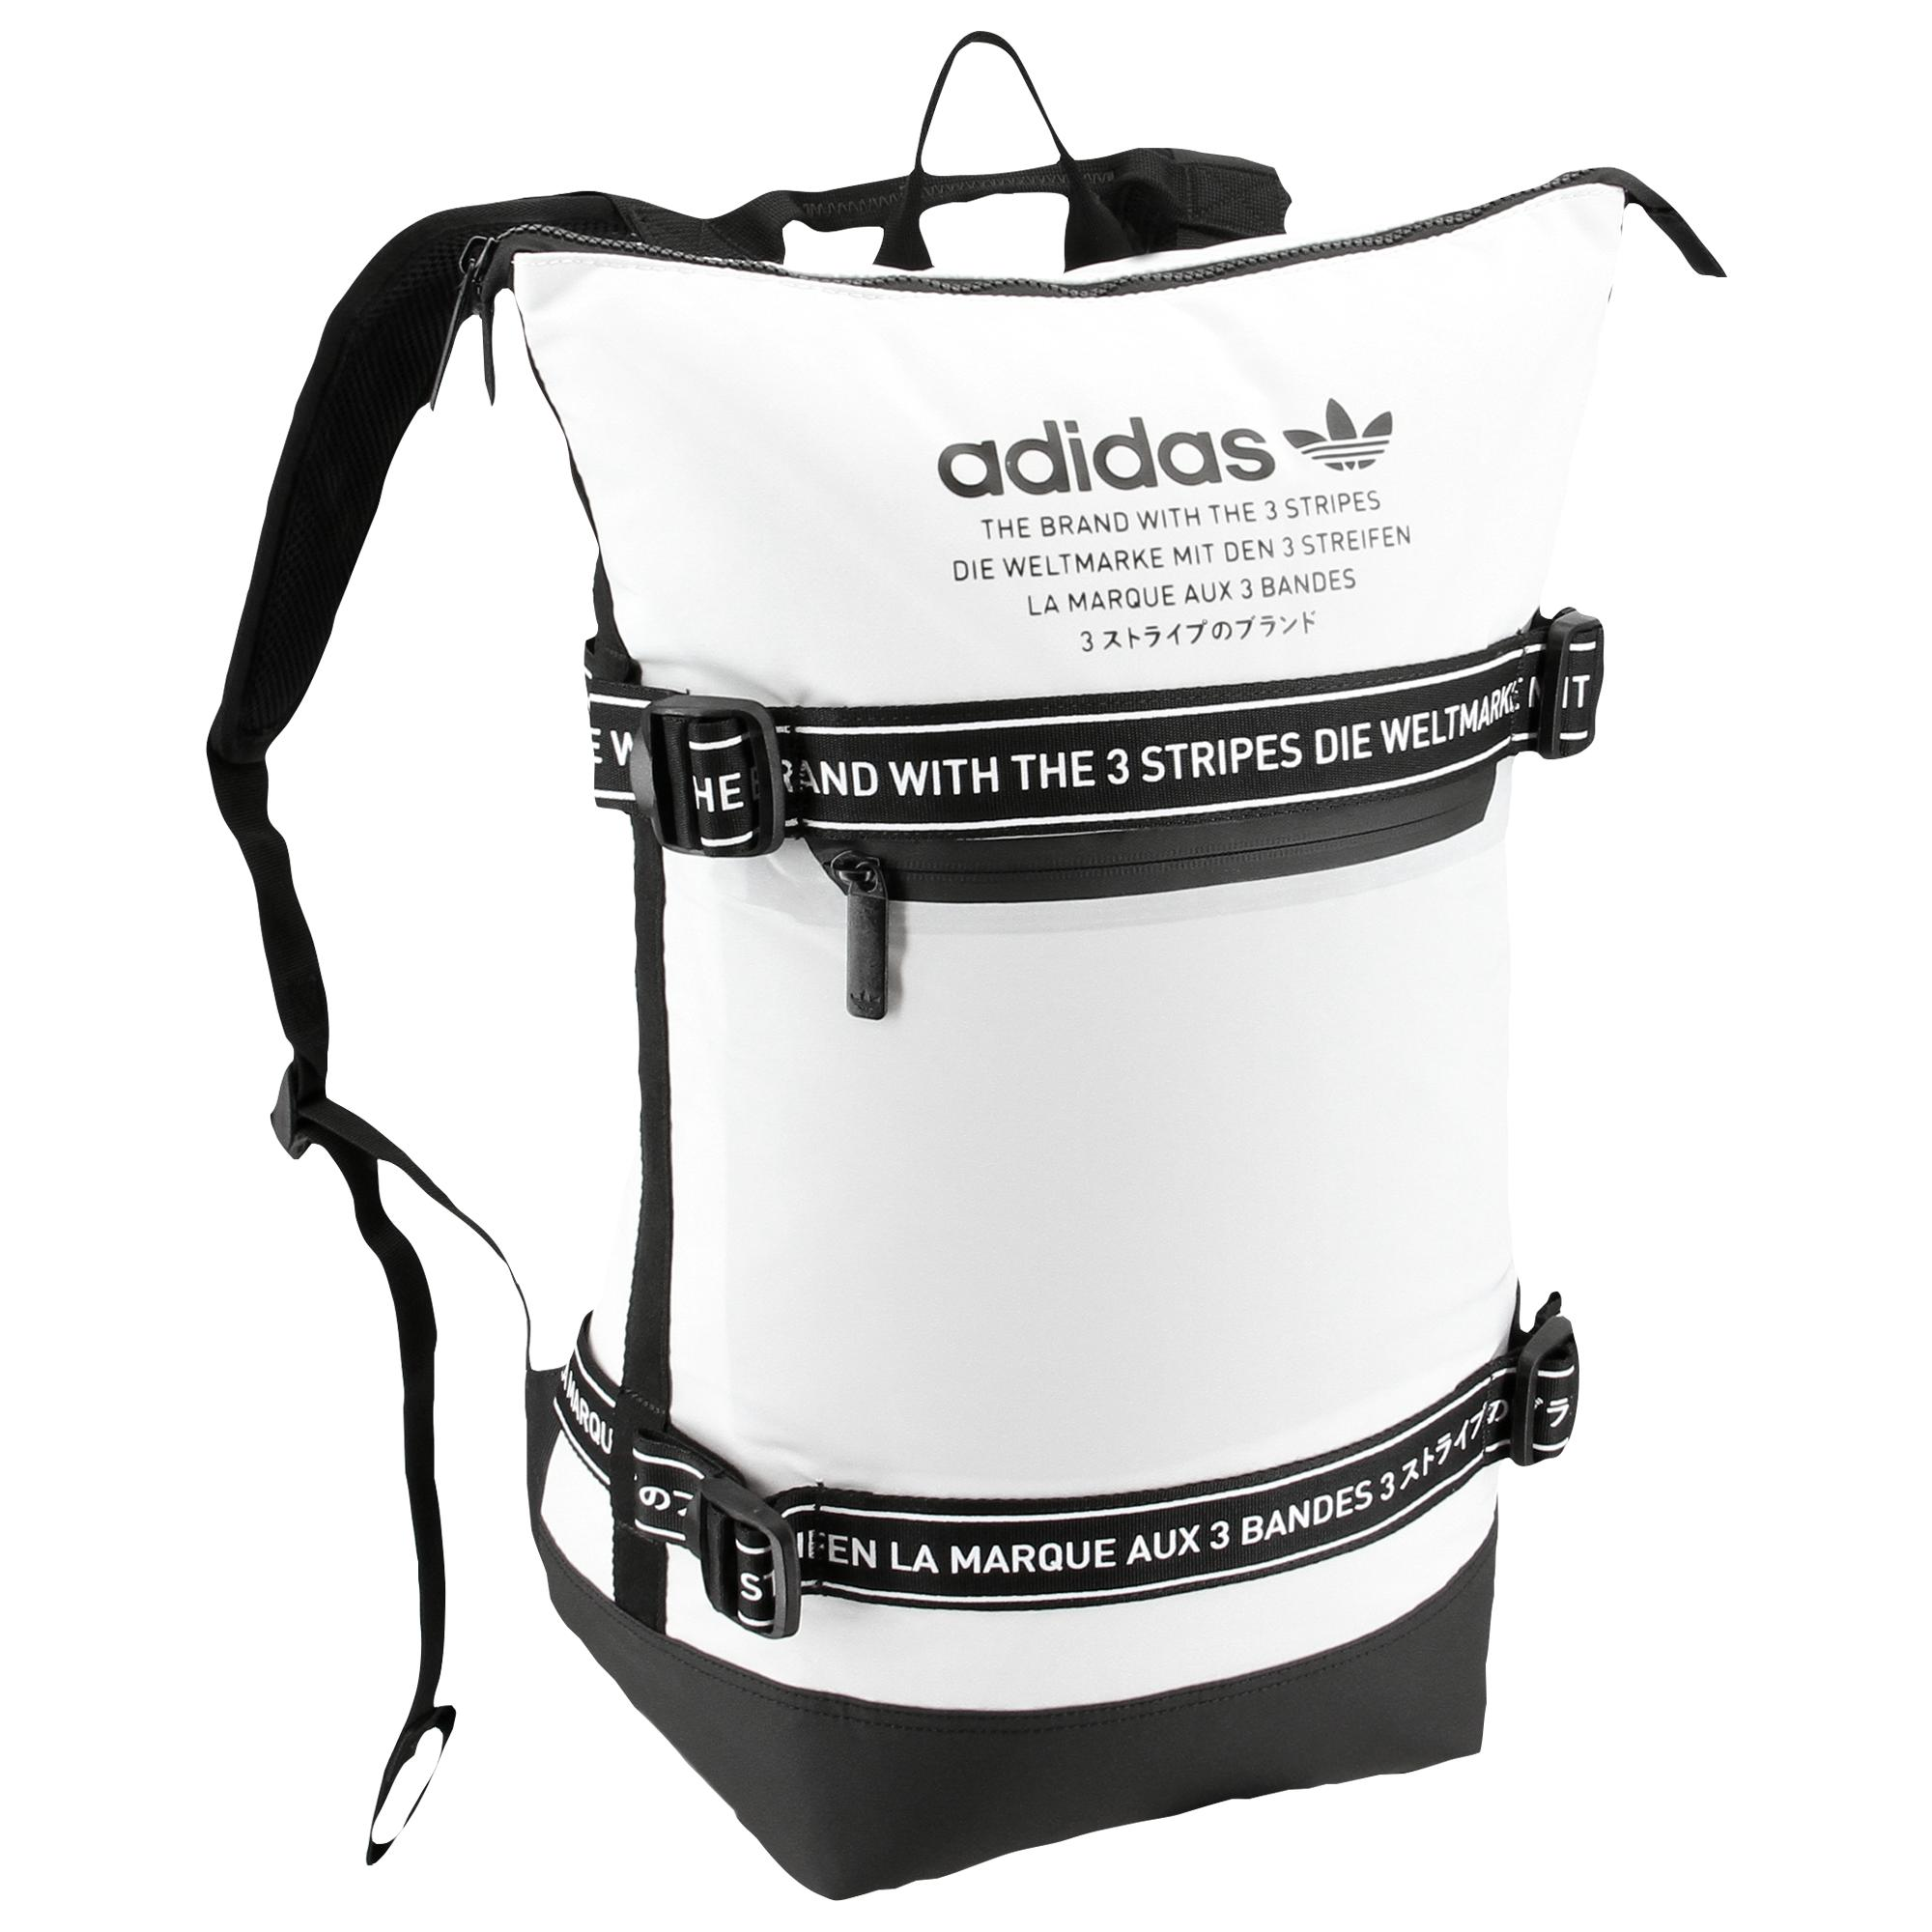 adidas nmd bag white - 58% OFF